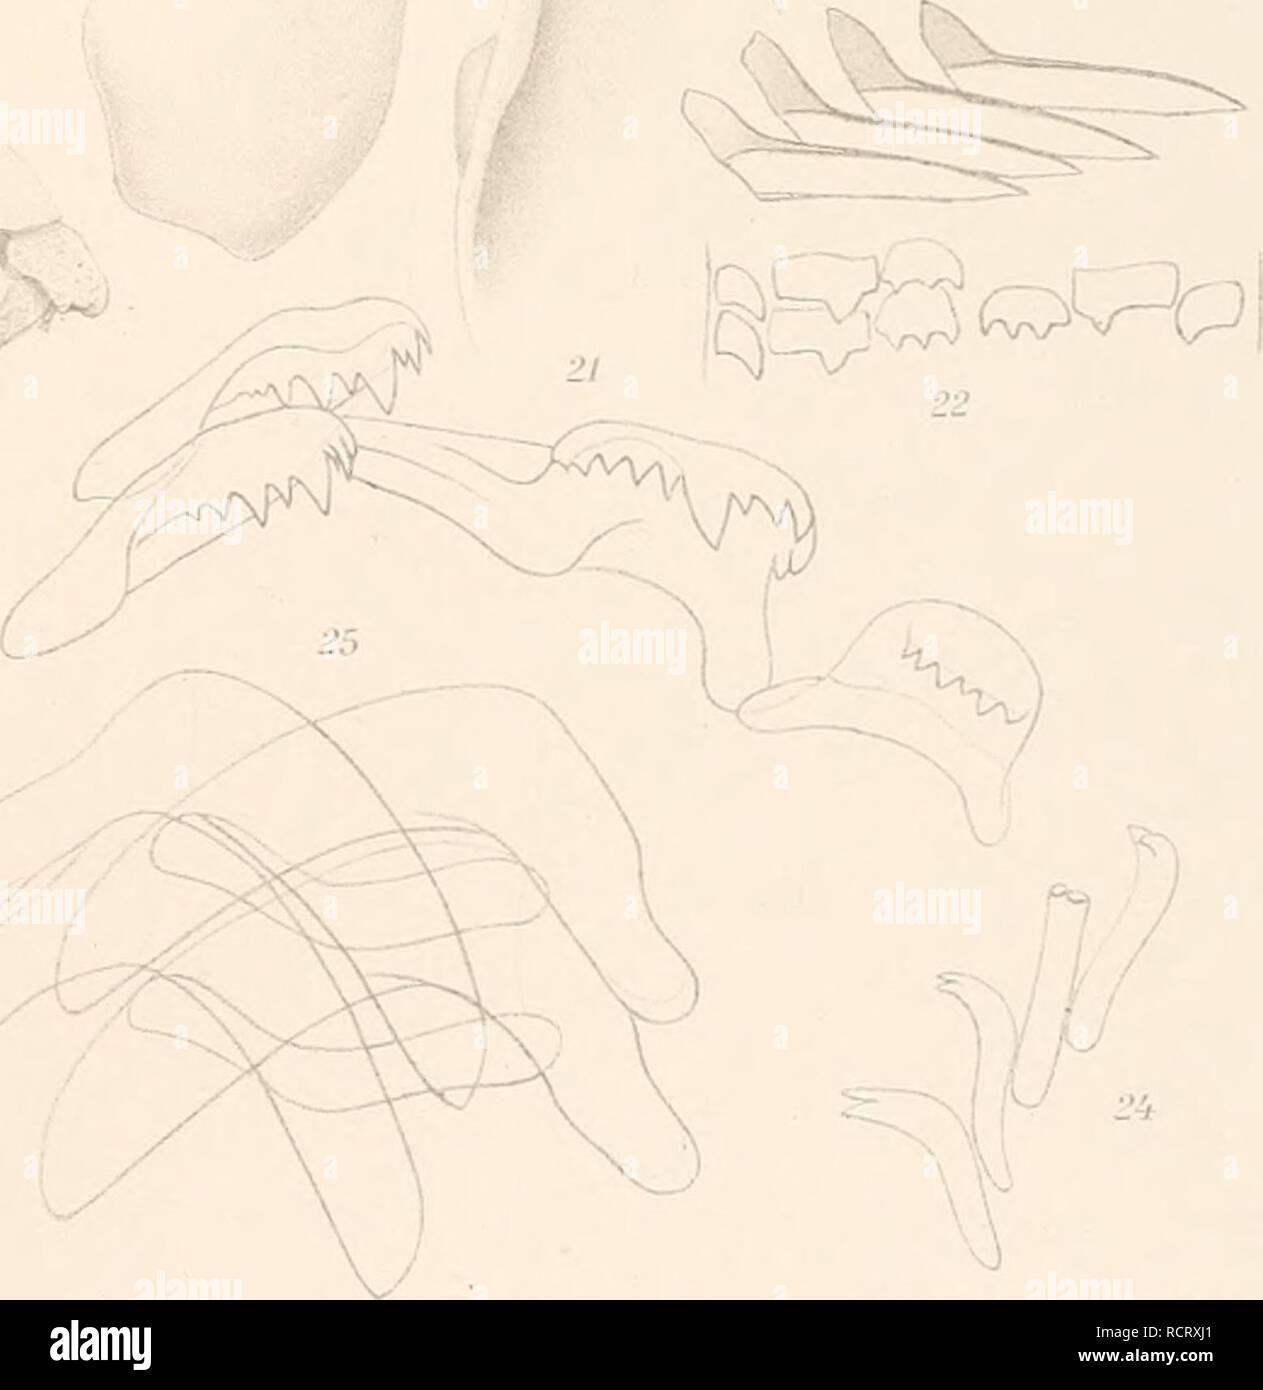 . Deutsche Südpolar-Expedition, 1901-1903, im Auftrage des Reichsamtes des Innern. Gauss (Ship); Scientific expeditions; Antarctica. / 3 Bathydoris clarigera, '1 Aegires albus, 5 Prodoridiincnliis ganssianus, 6 Oalvinella glacialis, 7,8 Notaeolidia rnfopida, .'). 10 Psendotrifonia quadrangnlaris, 11 Dolo sp., 12 Cratena exigna, 13 Cominella Ficulina) bouveti, 11 Phasianella 1 Chromotis nnniieri, 15 Jeffreysiopsis duperrei, 16 Skenella sp., 17 Diaphanella fragilis, 18,19 Lobiger Lophoplrura) capensis, 20 Pleurotomella frigida, 21 Jeffreysiopsis duperrei, 22 Diaphanella fragilis, 23,24 Cadlina k - Stock Image